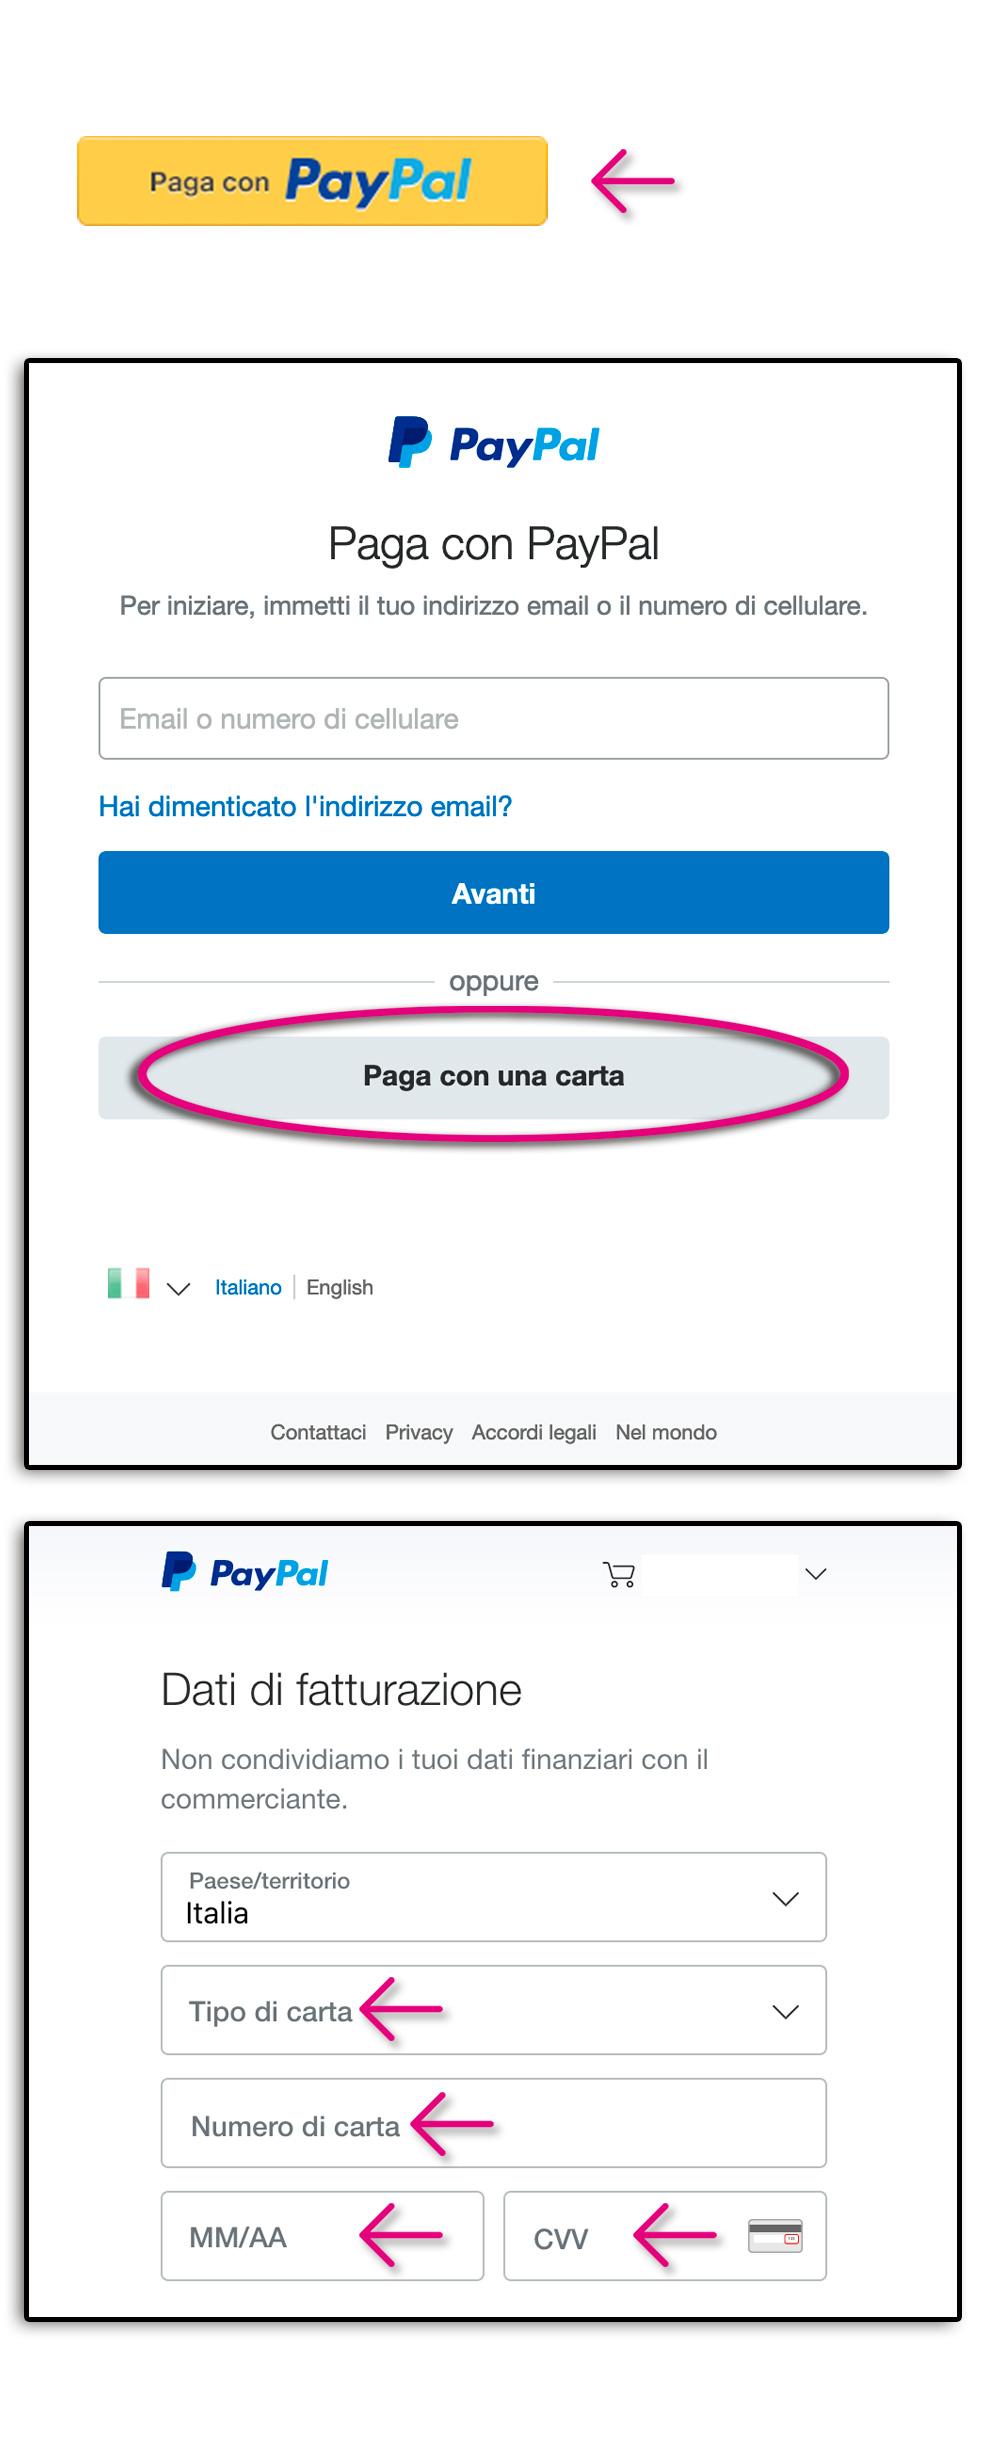 paga_con_carta_con_paypal.jpg